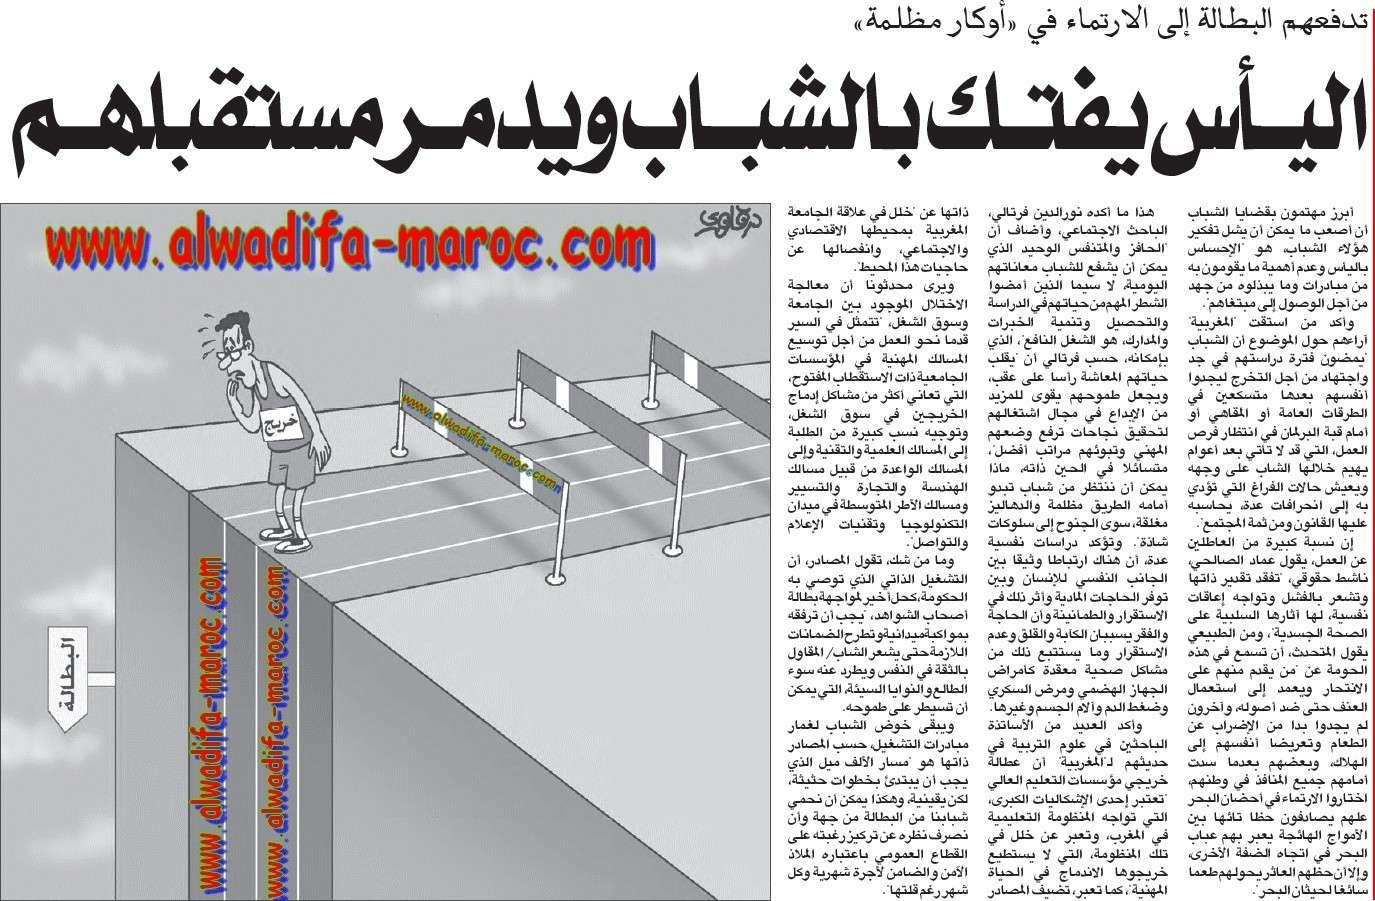 alwadifa-maroc.com